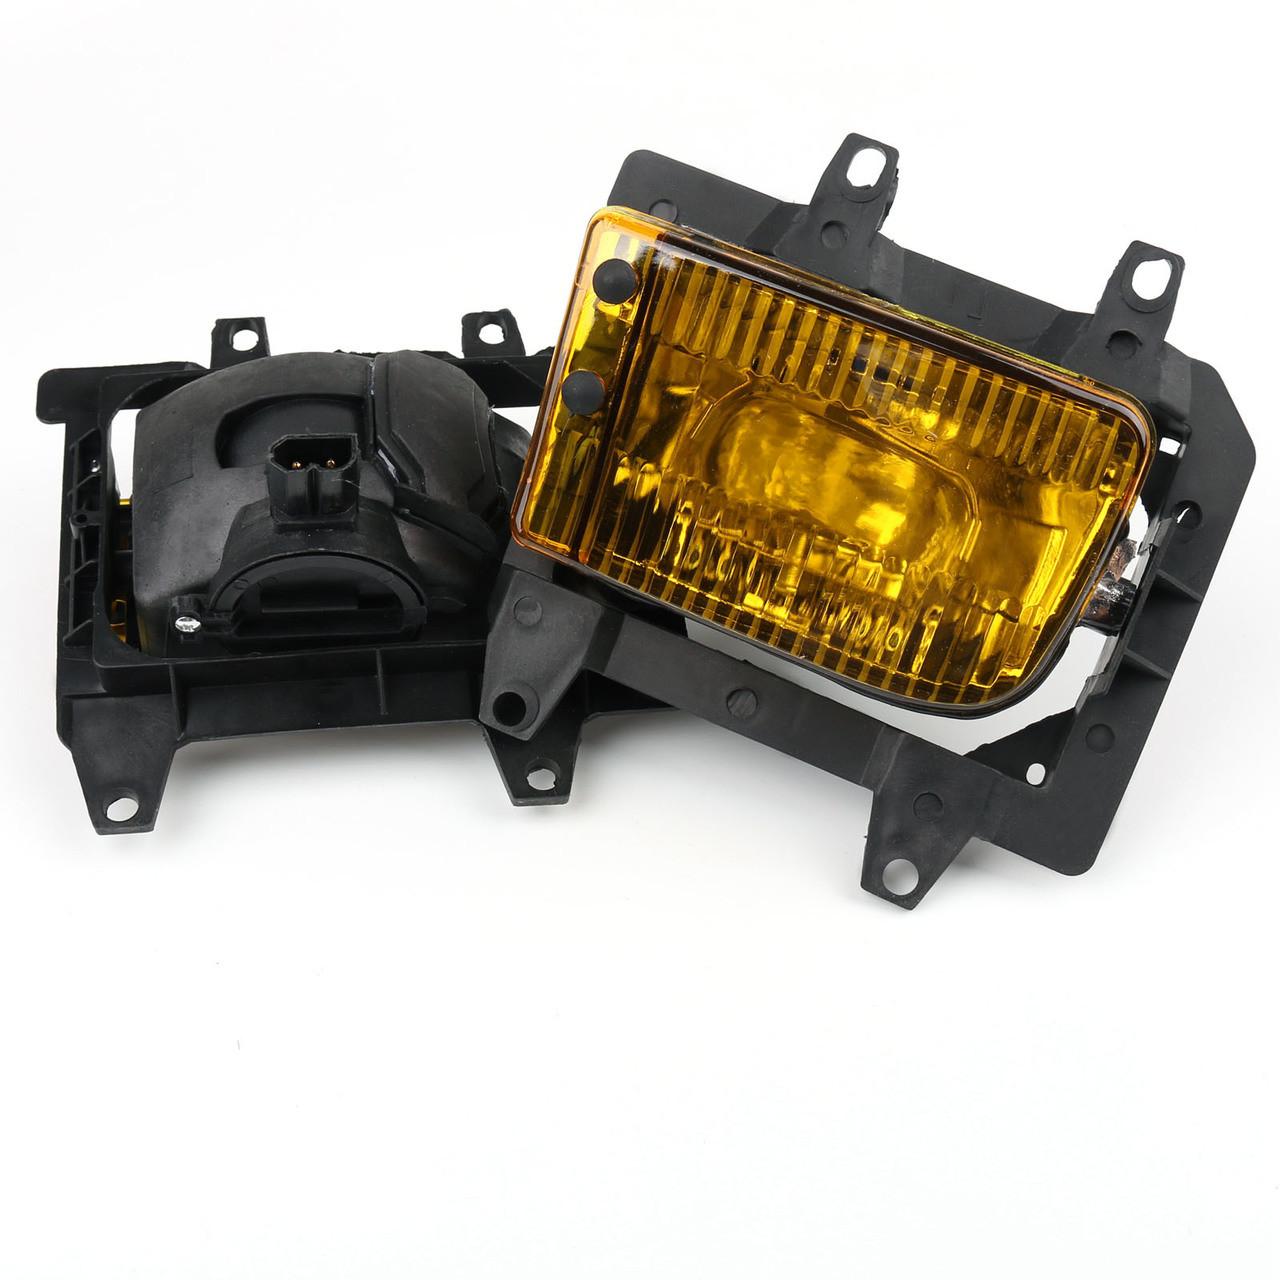 http://www.madhornets.store/AMZ/CarPart/CarFog/C115-015/C115-015-Yellow-4.jpg